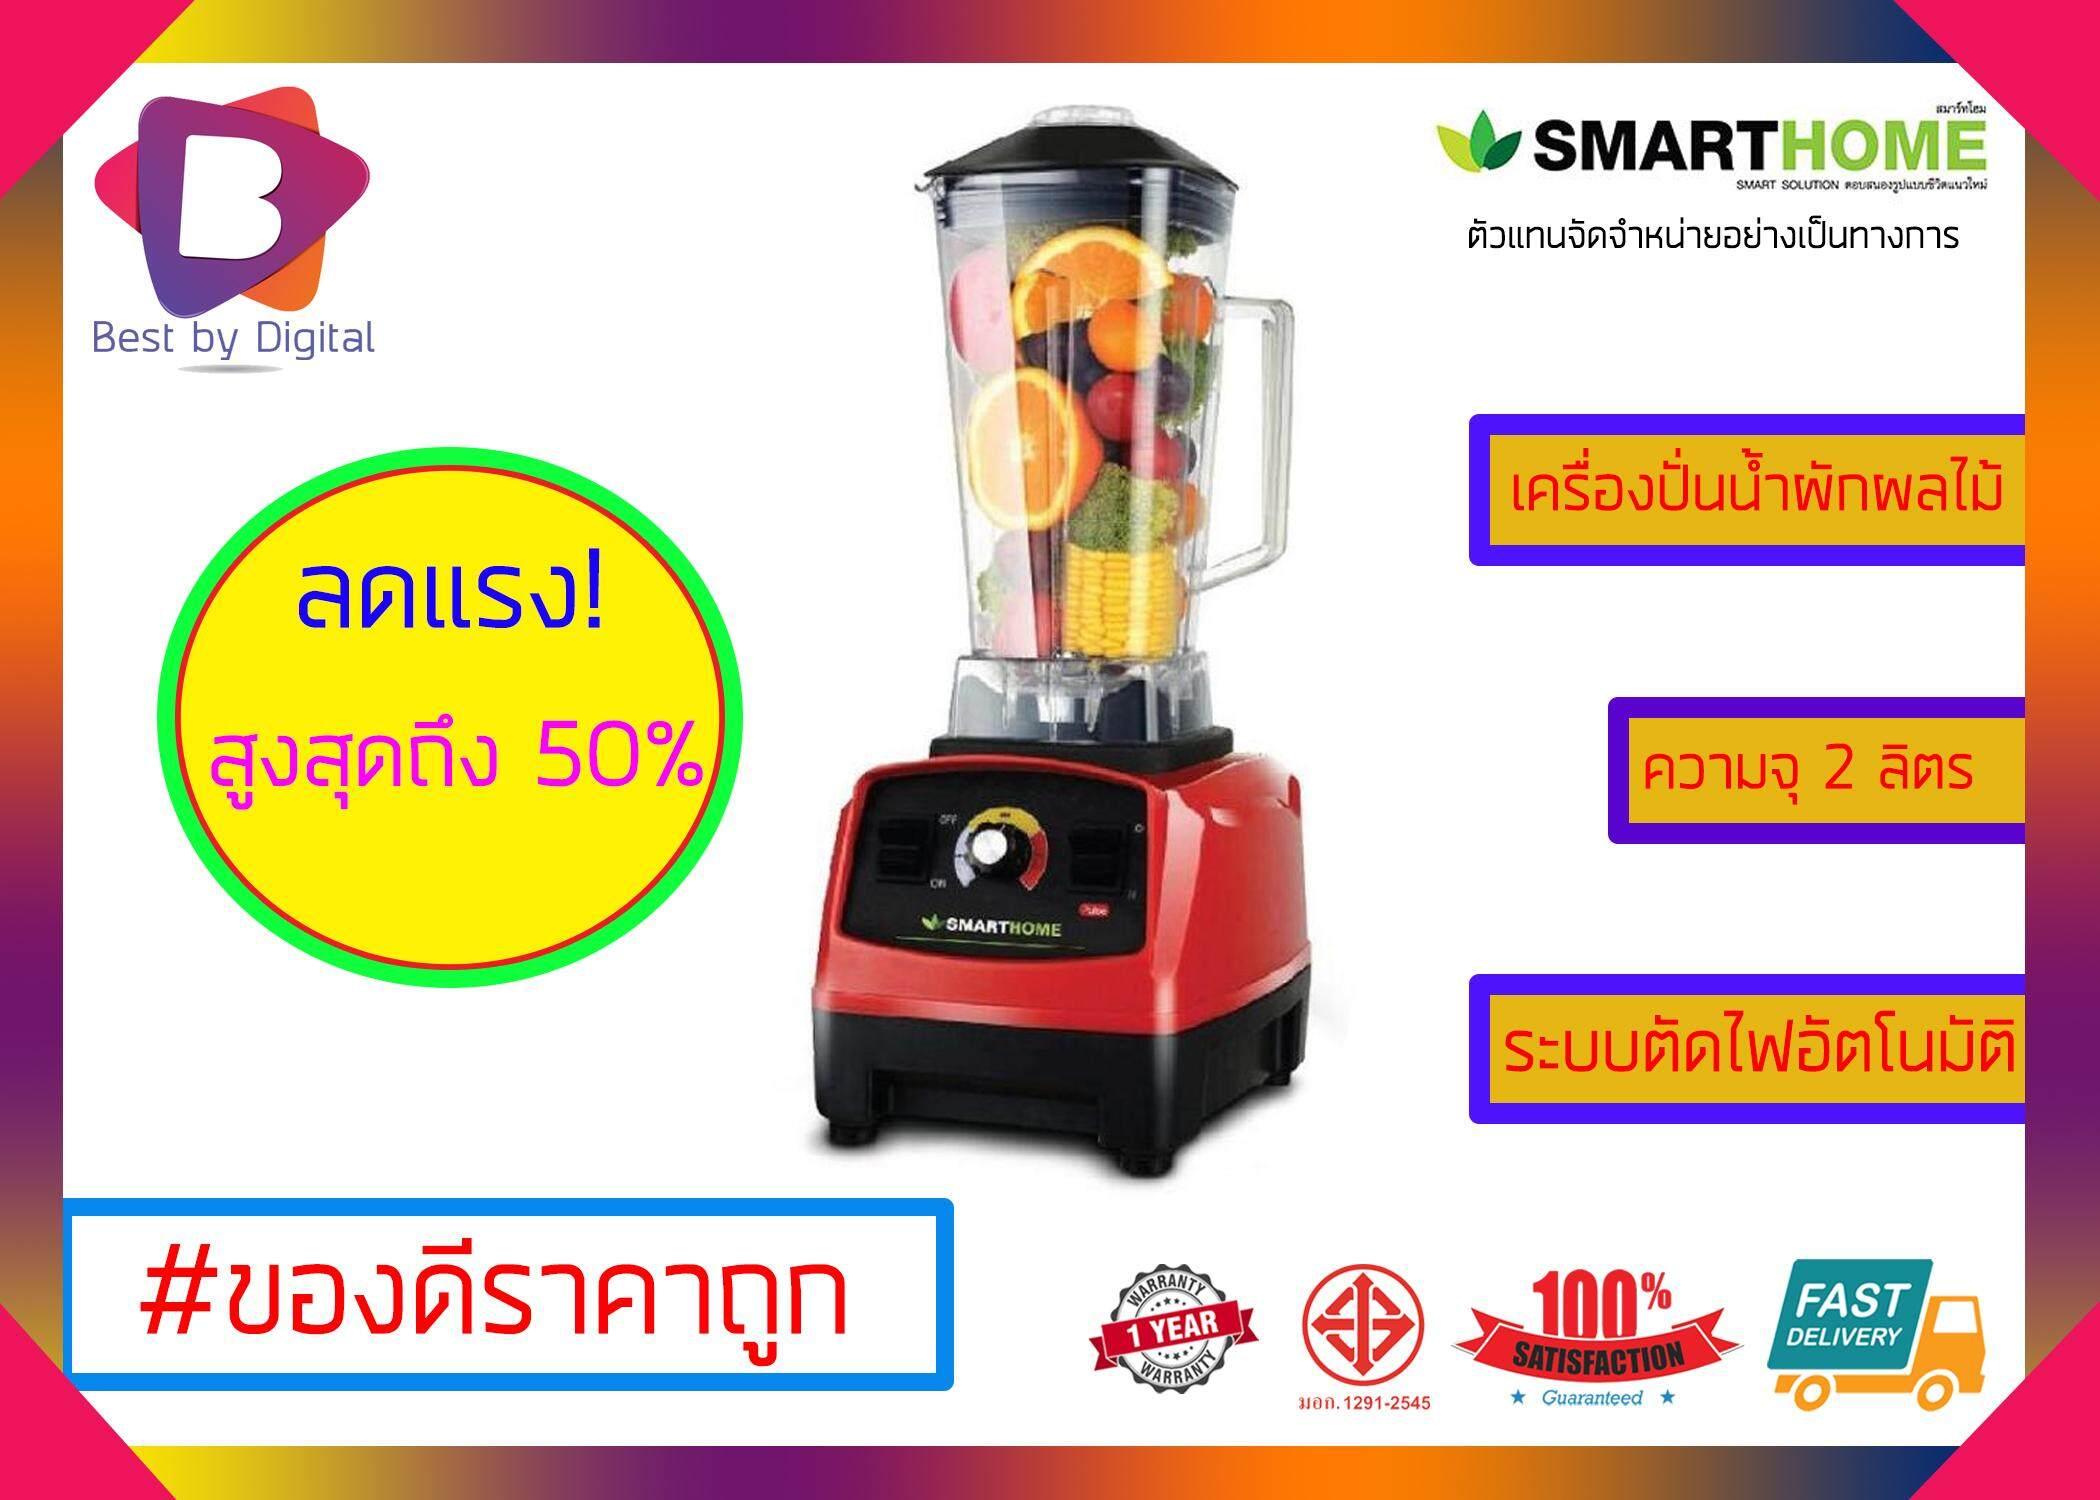 SMARTHOME เครื่องปั่นน้ำผักผลไม้เชิงพาณิชย์ BD-2010